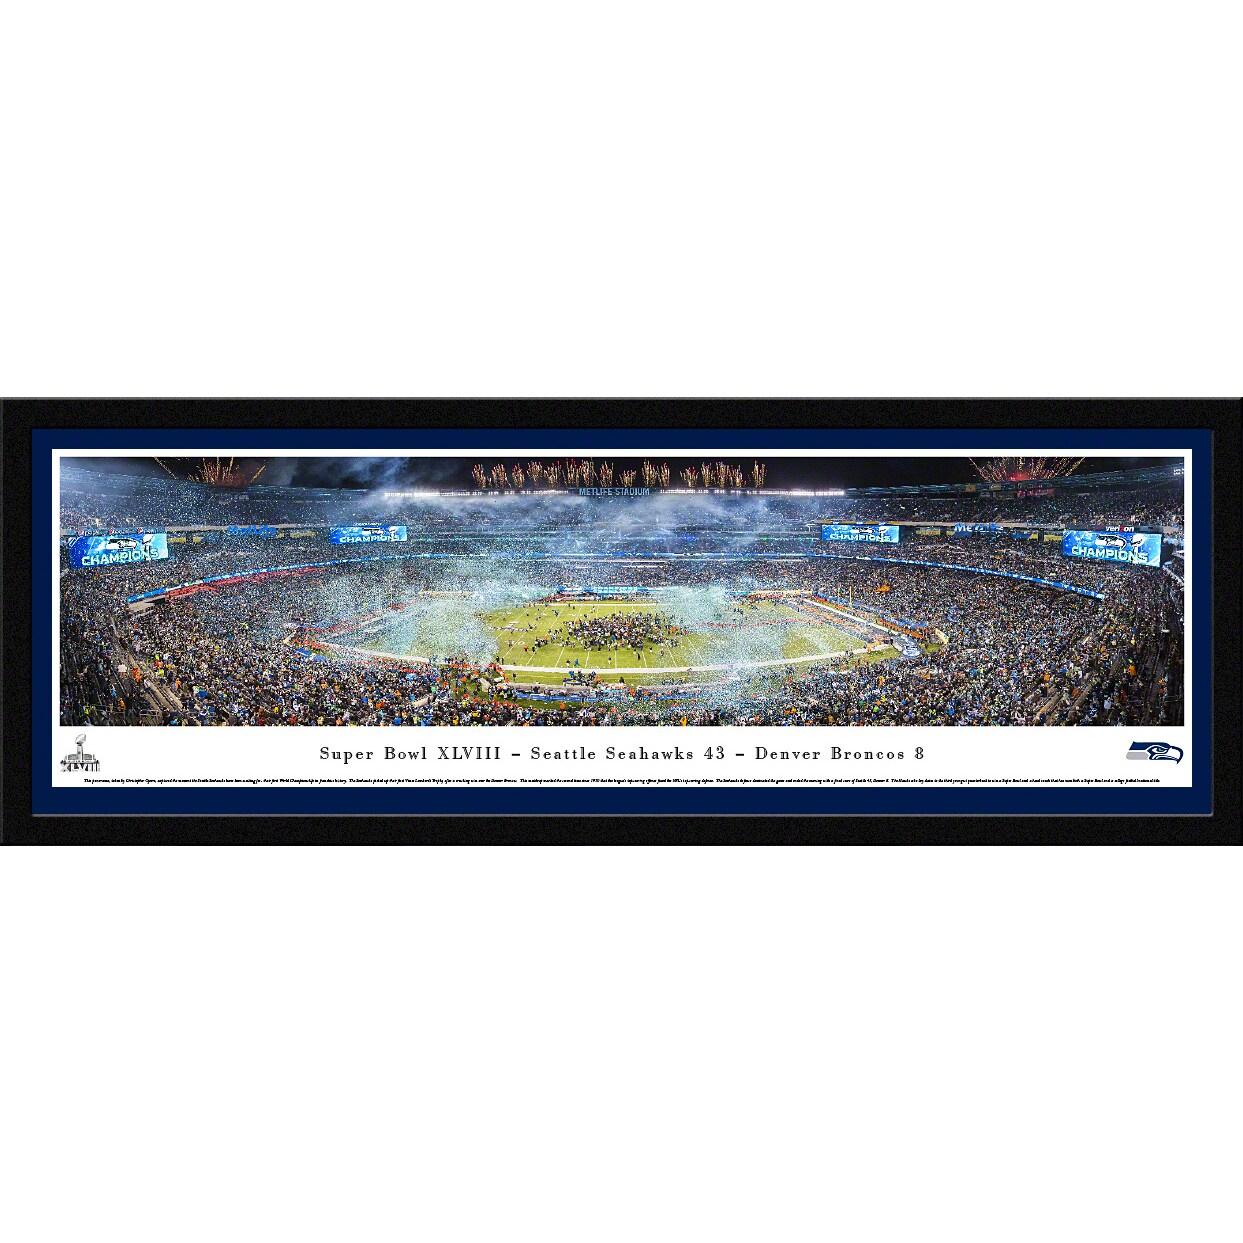 "Seattle Seahawks Super Bowl XLVIII 16"" x 42"" Select Frame Panoramic Photo"